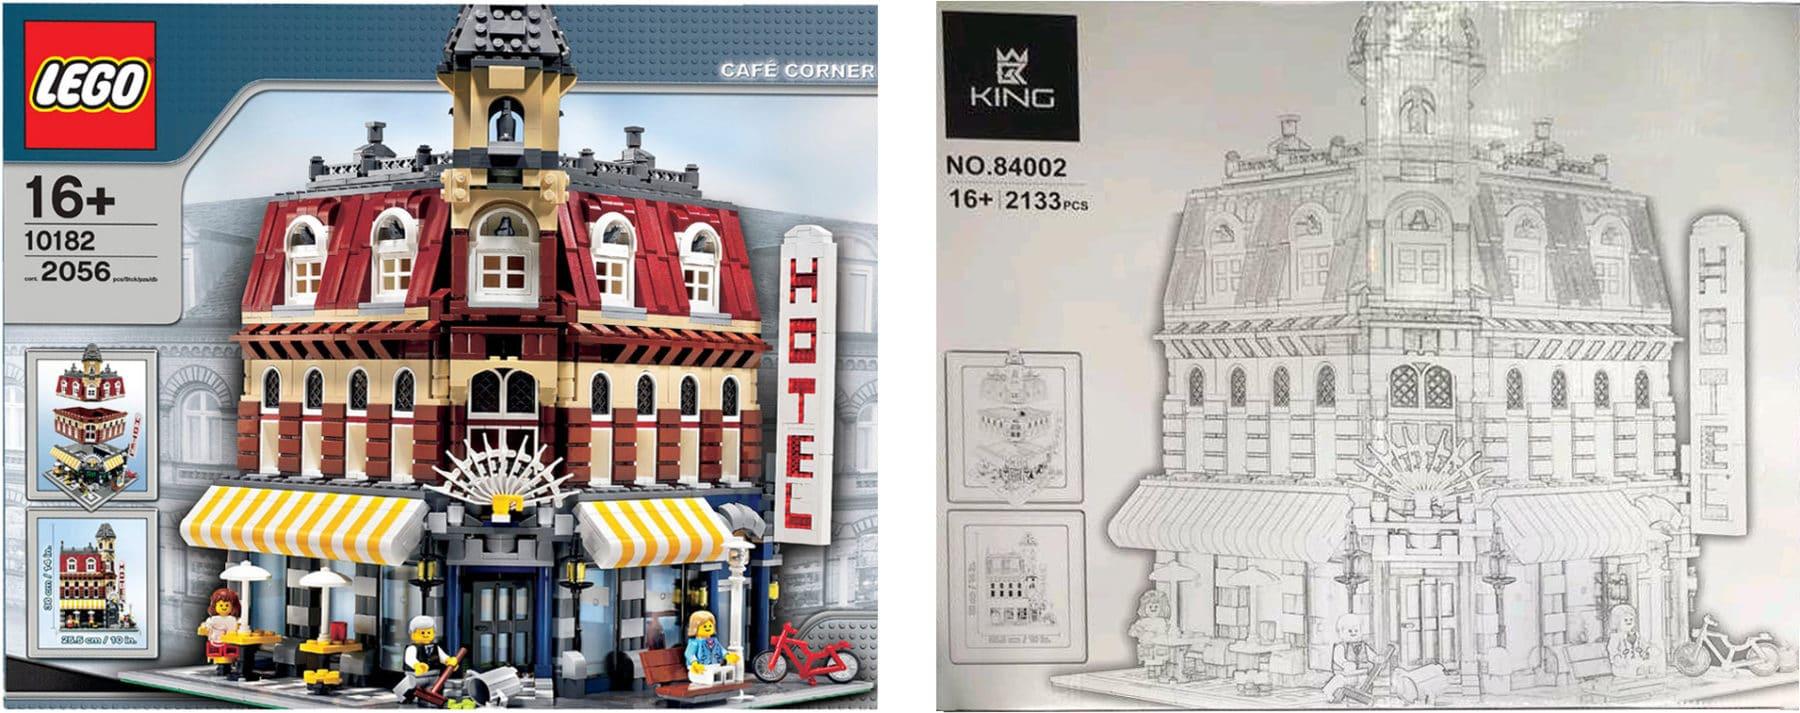 LEGO Karton vs. King Bricks Fälschung